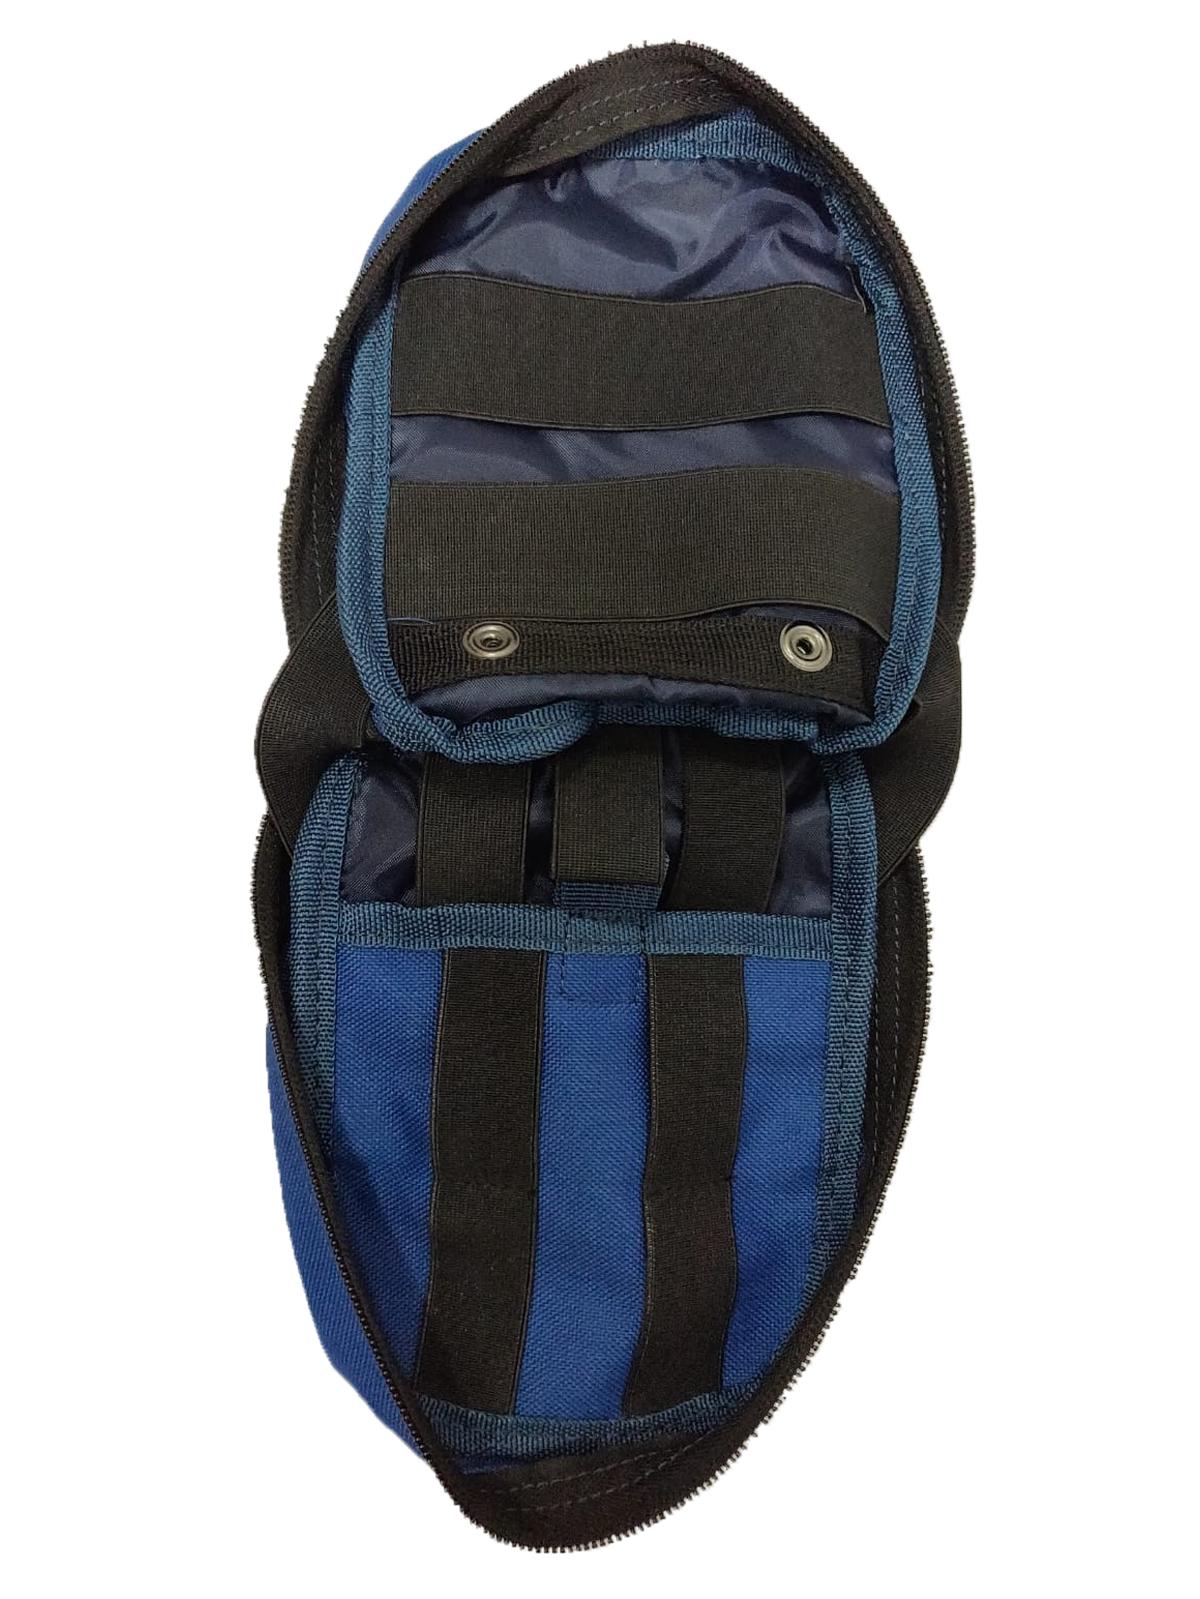 blue-pouch-3.jpg